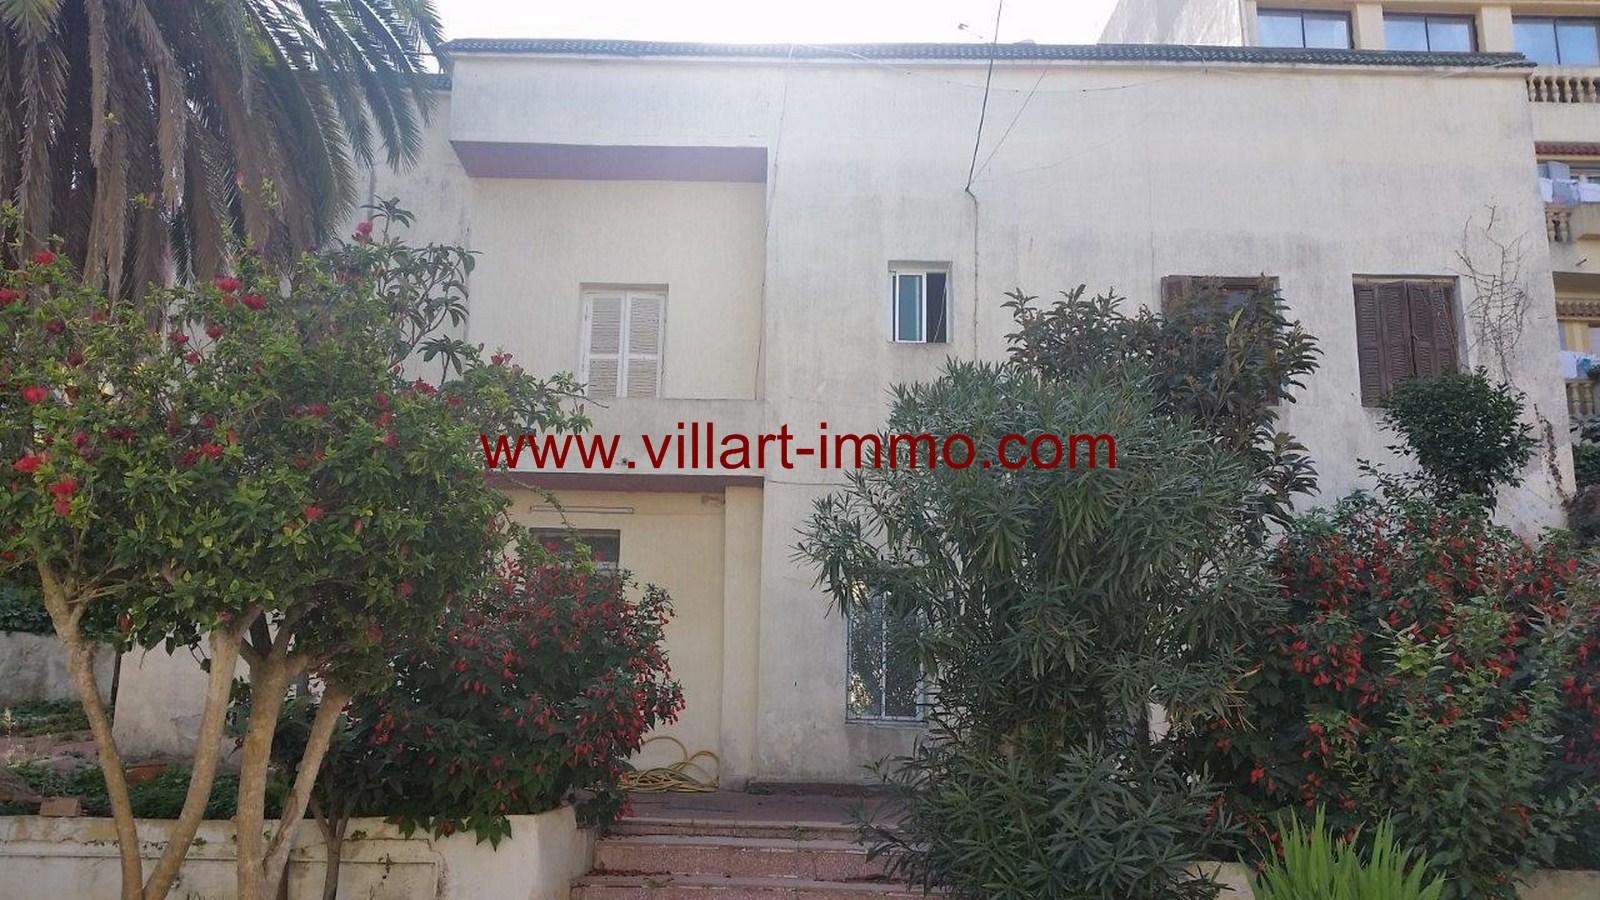 2-vente-maison-tanger-marchan-jardin-1-vm381-villart-immo